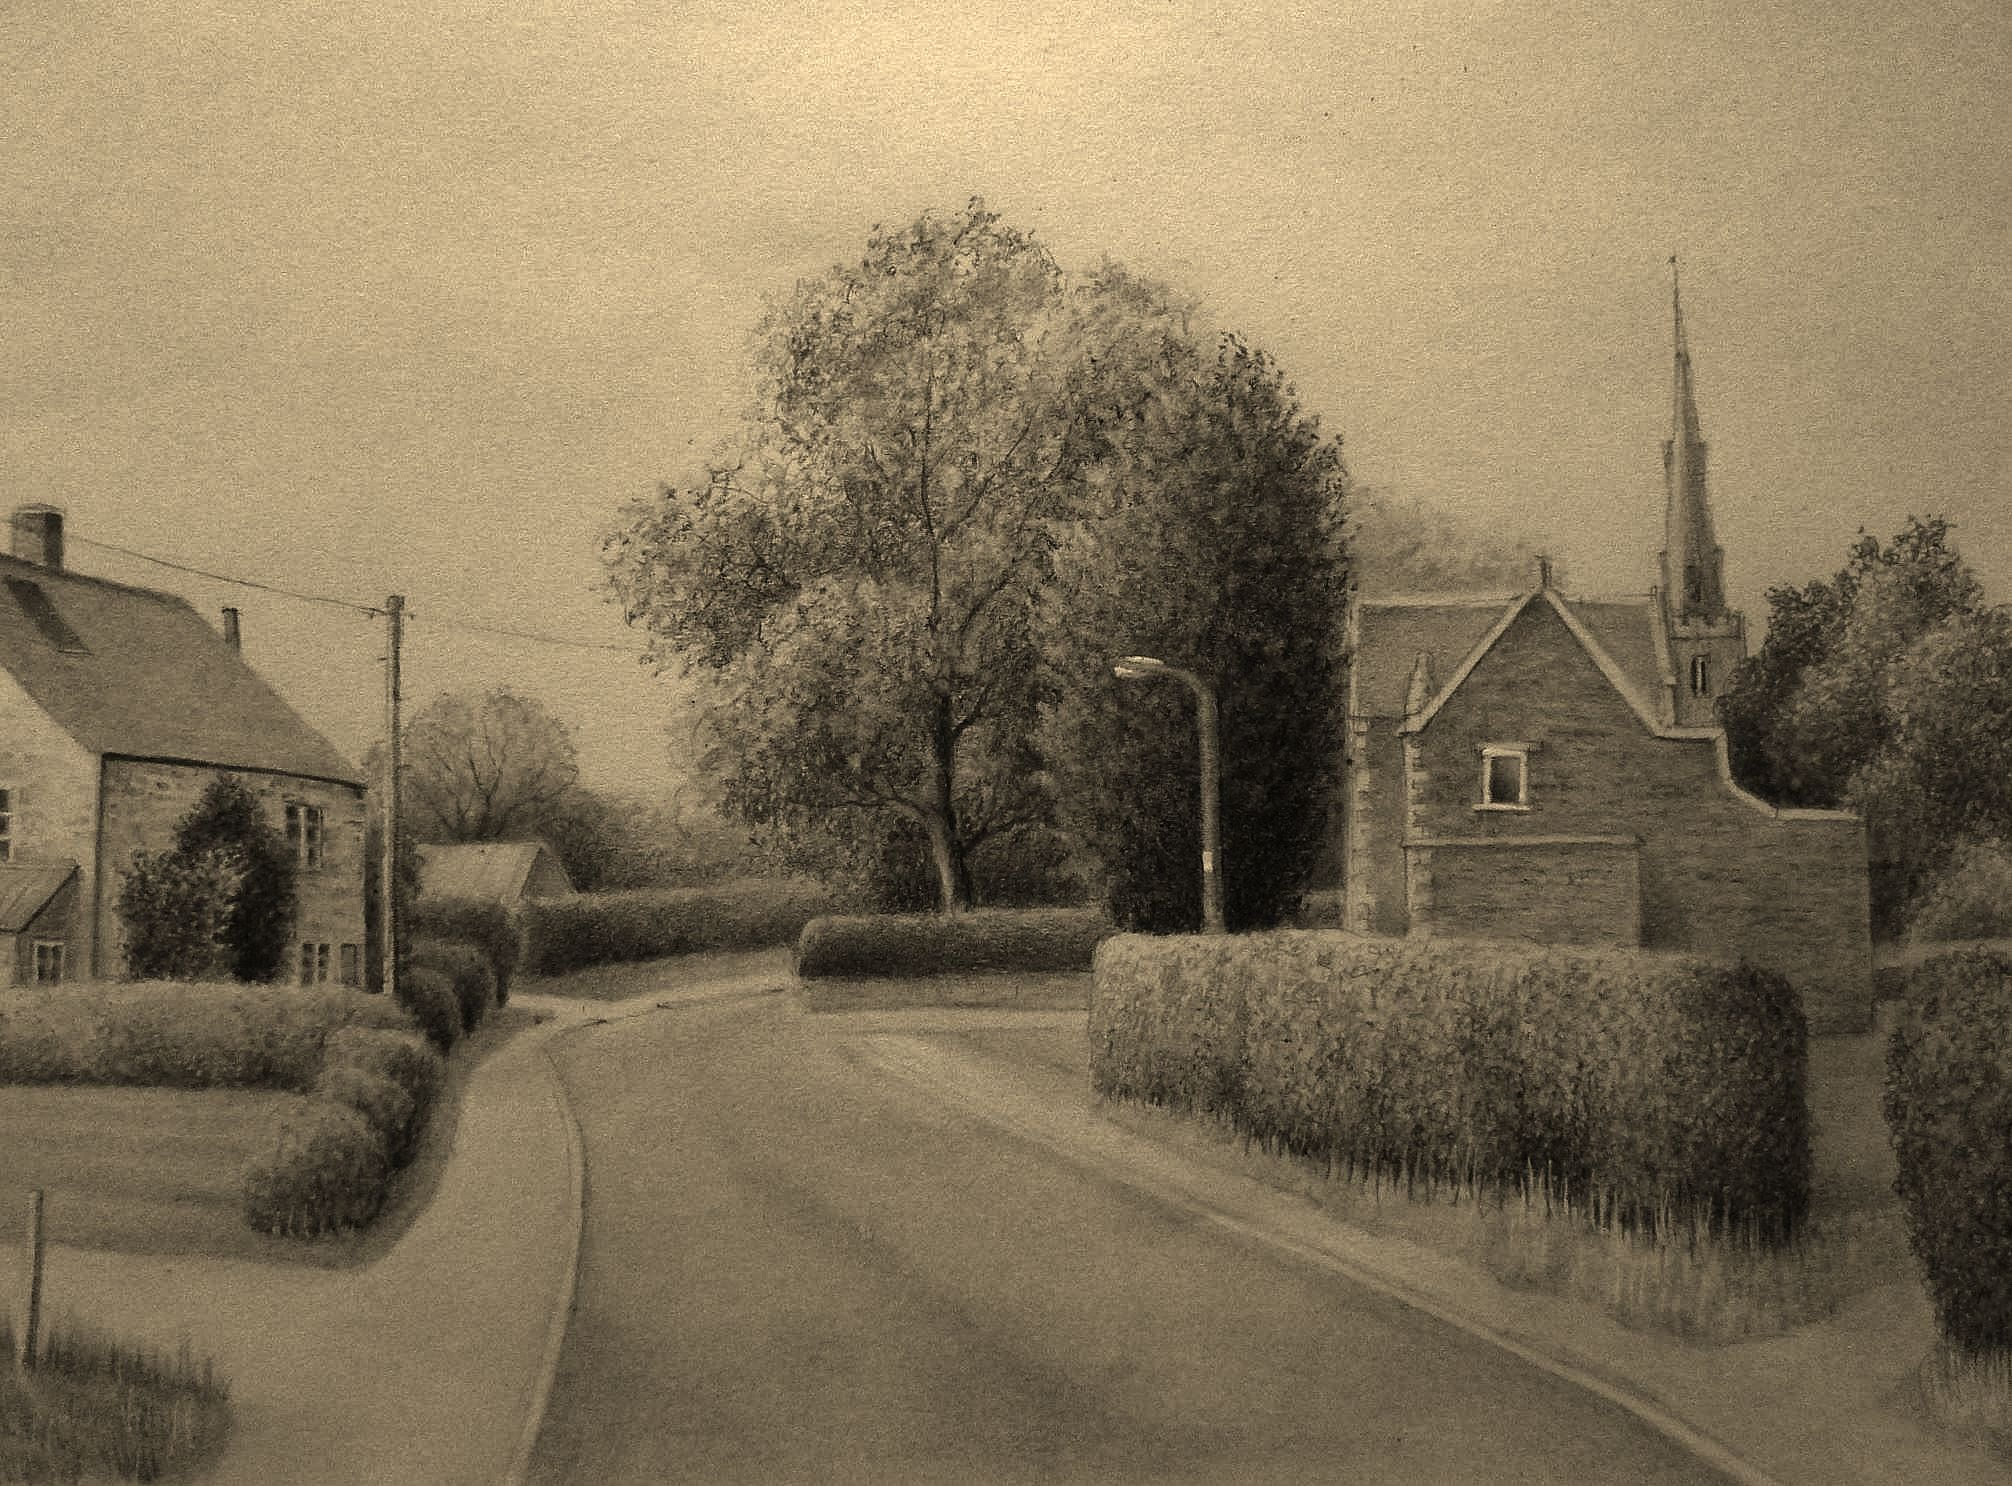 2012x1486 Landscape Pencil Drawing, A South Leicestershire Village